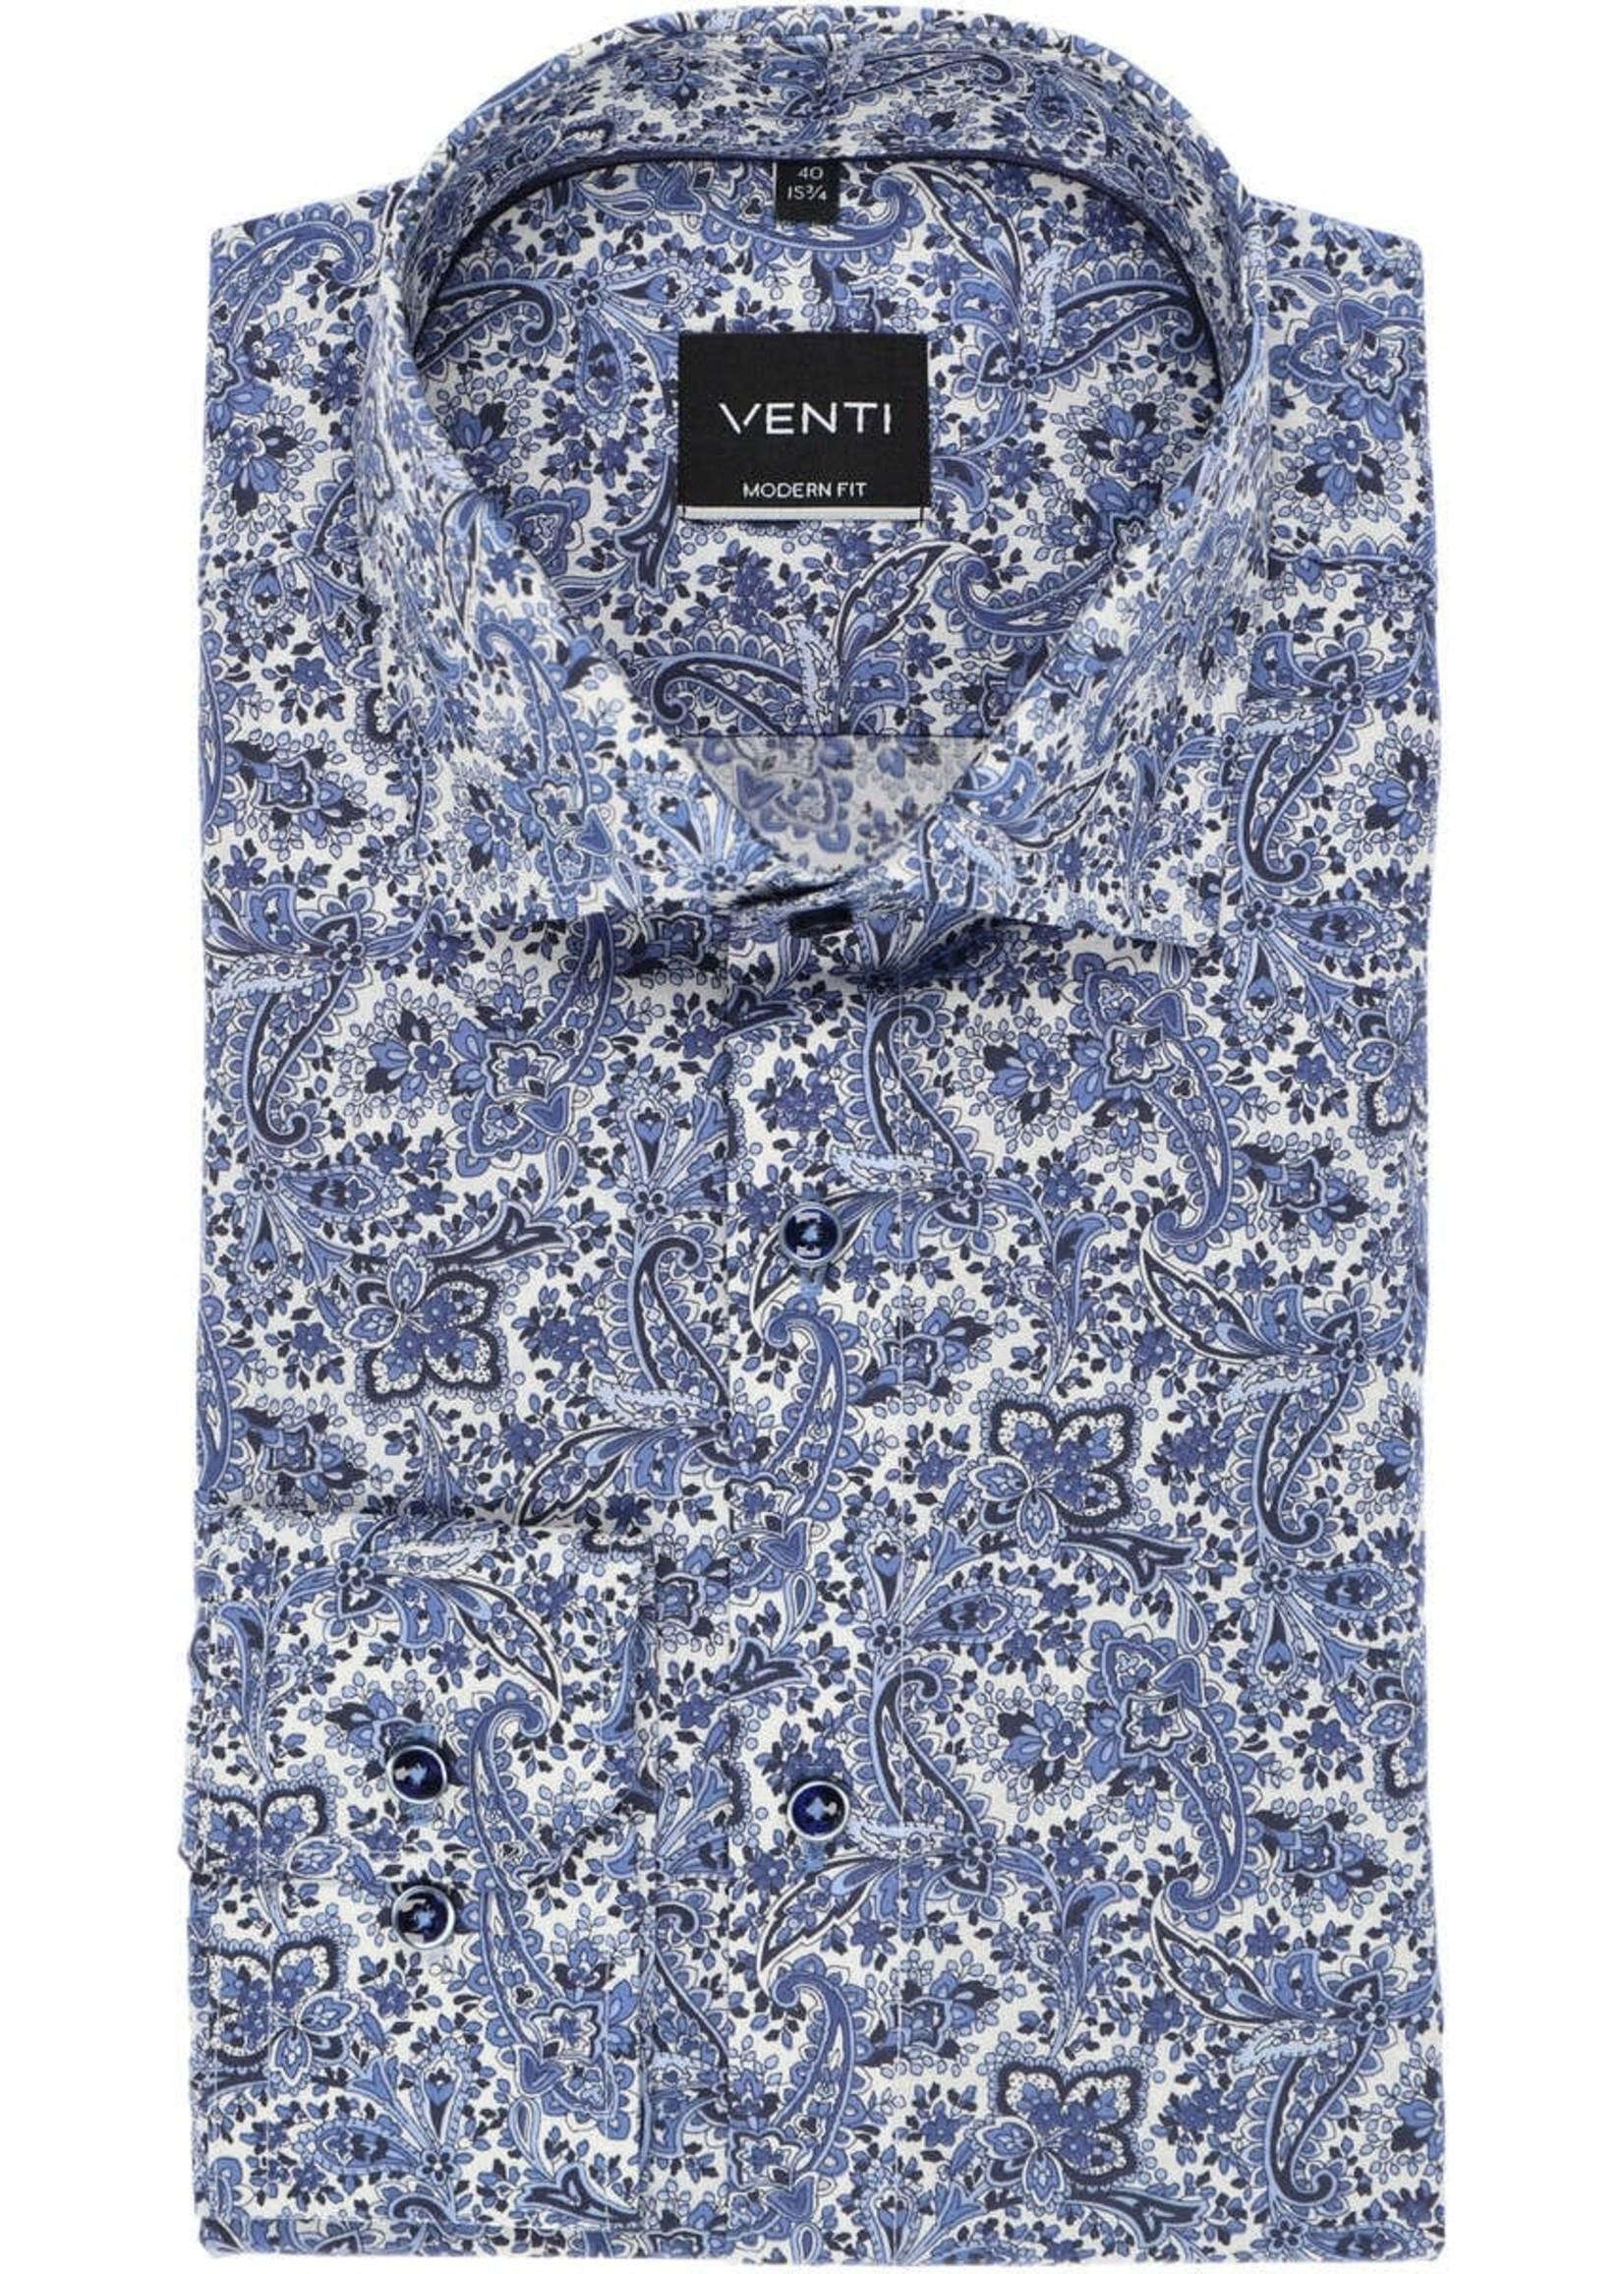 Venti Venti Modern Fit Dress Shirt 103368700